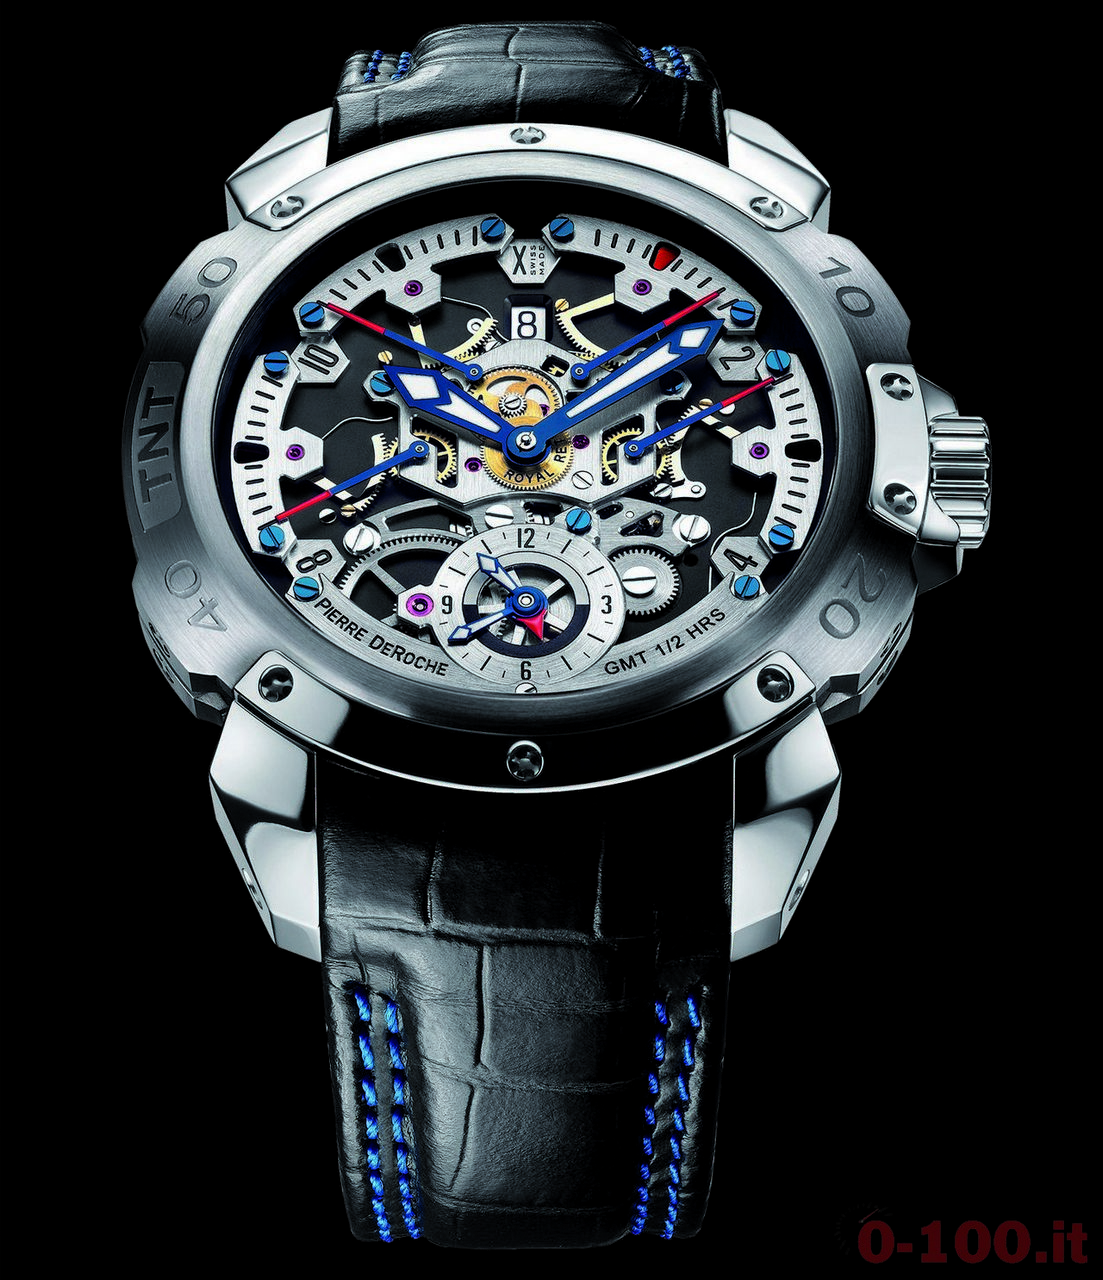 anteprima-baselworld-2015-pierre-deroche-tnt-royal-retro-gmt-½-hour-limited-edition_0-100_3